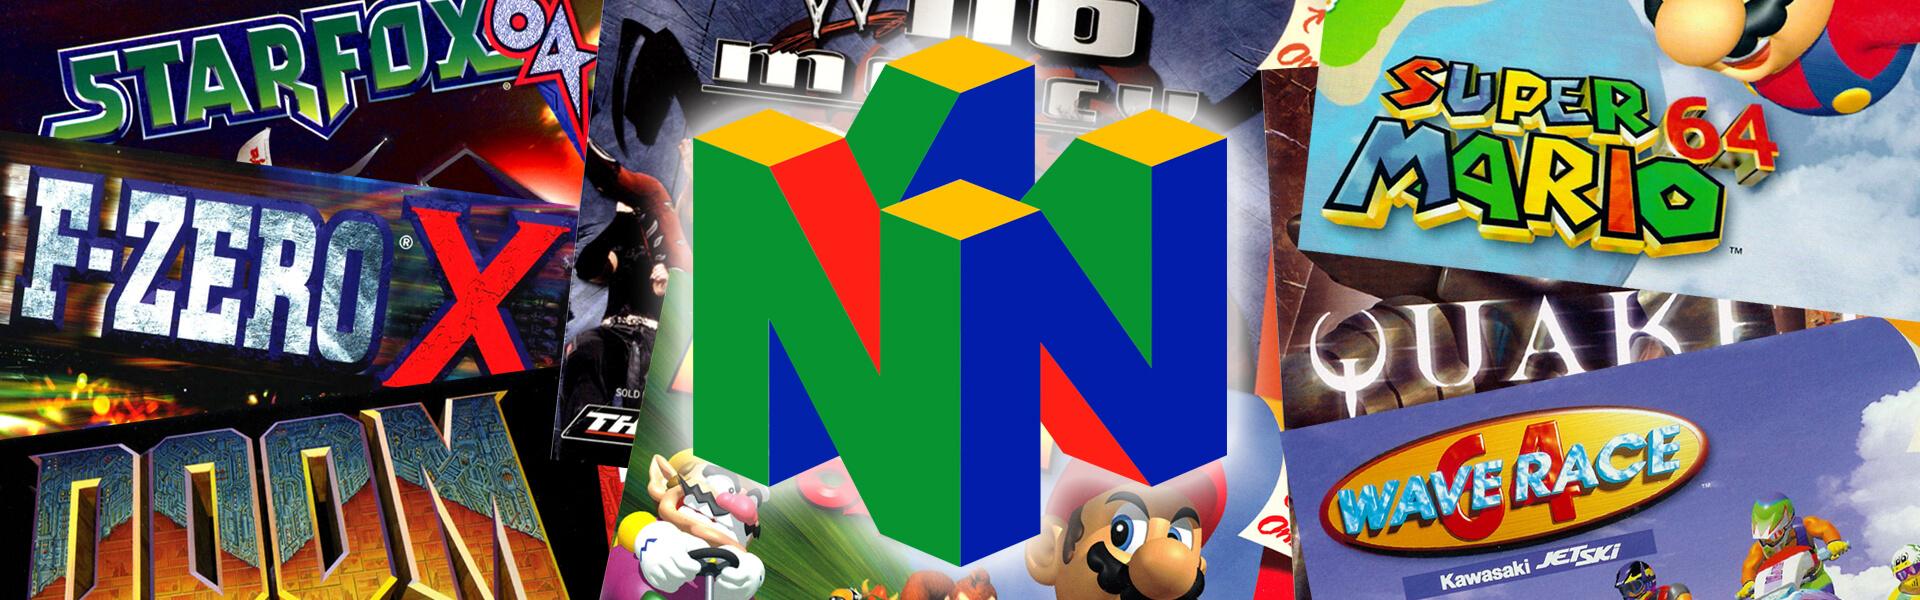 MPU_Ep26_Nintendo_64_1920x600